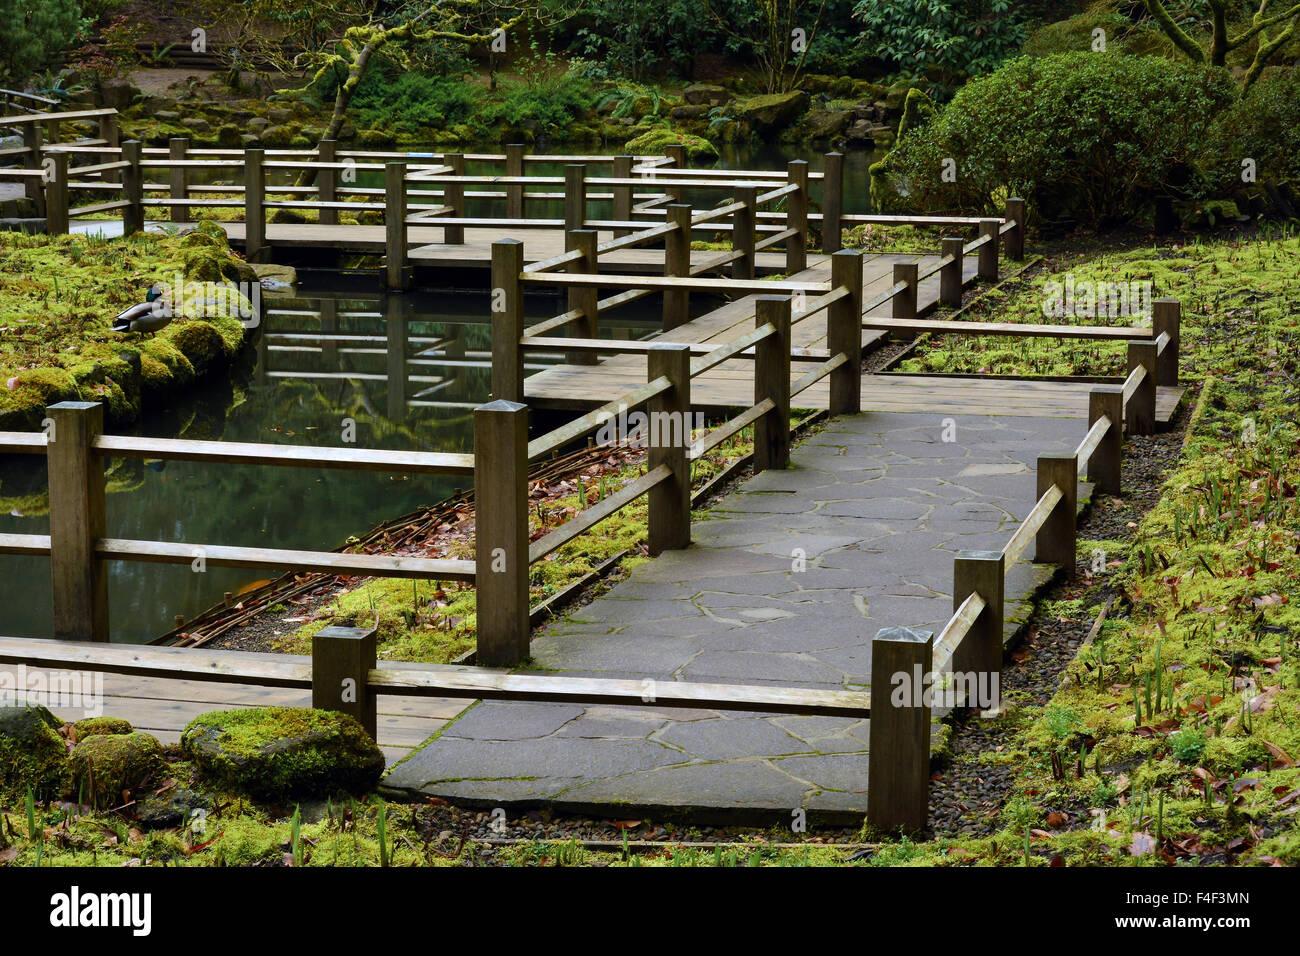 Deck, Railing, Portland Japanese Garden, Portland, Oregon, USA (PR)